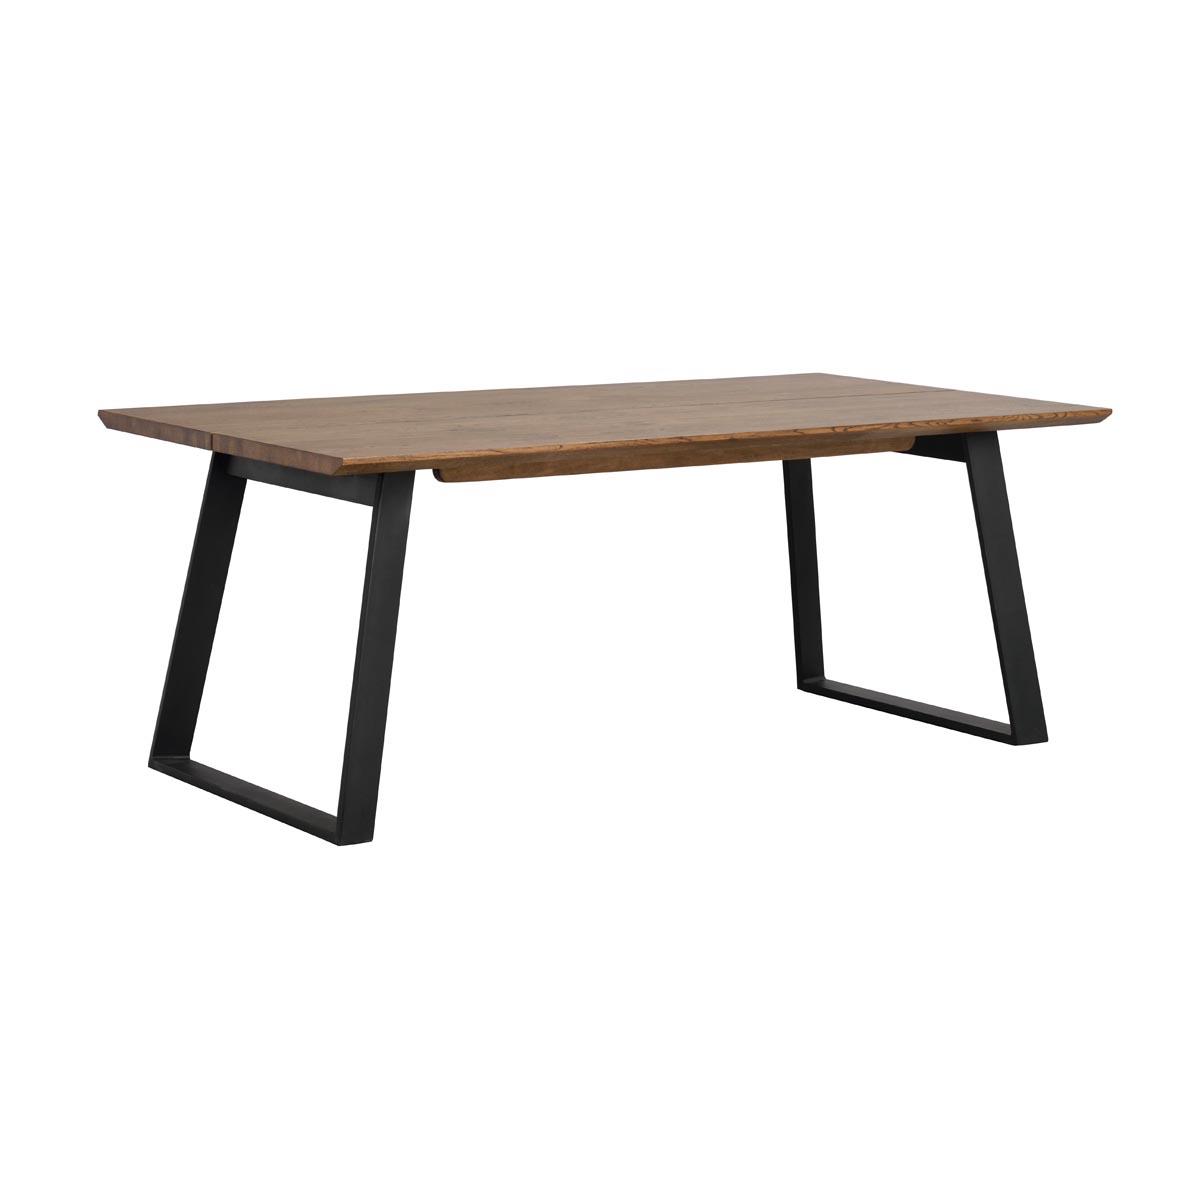 Melville-matbord-brunbets-vildek-119374_